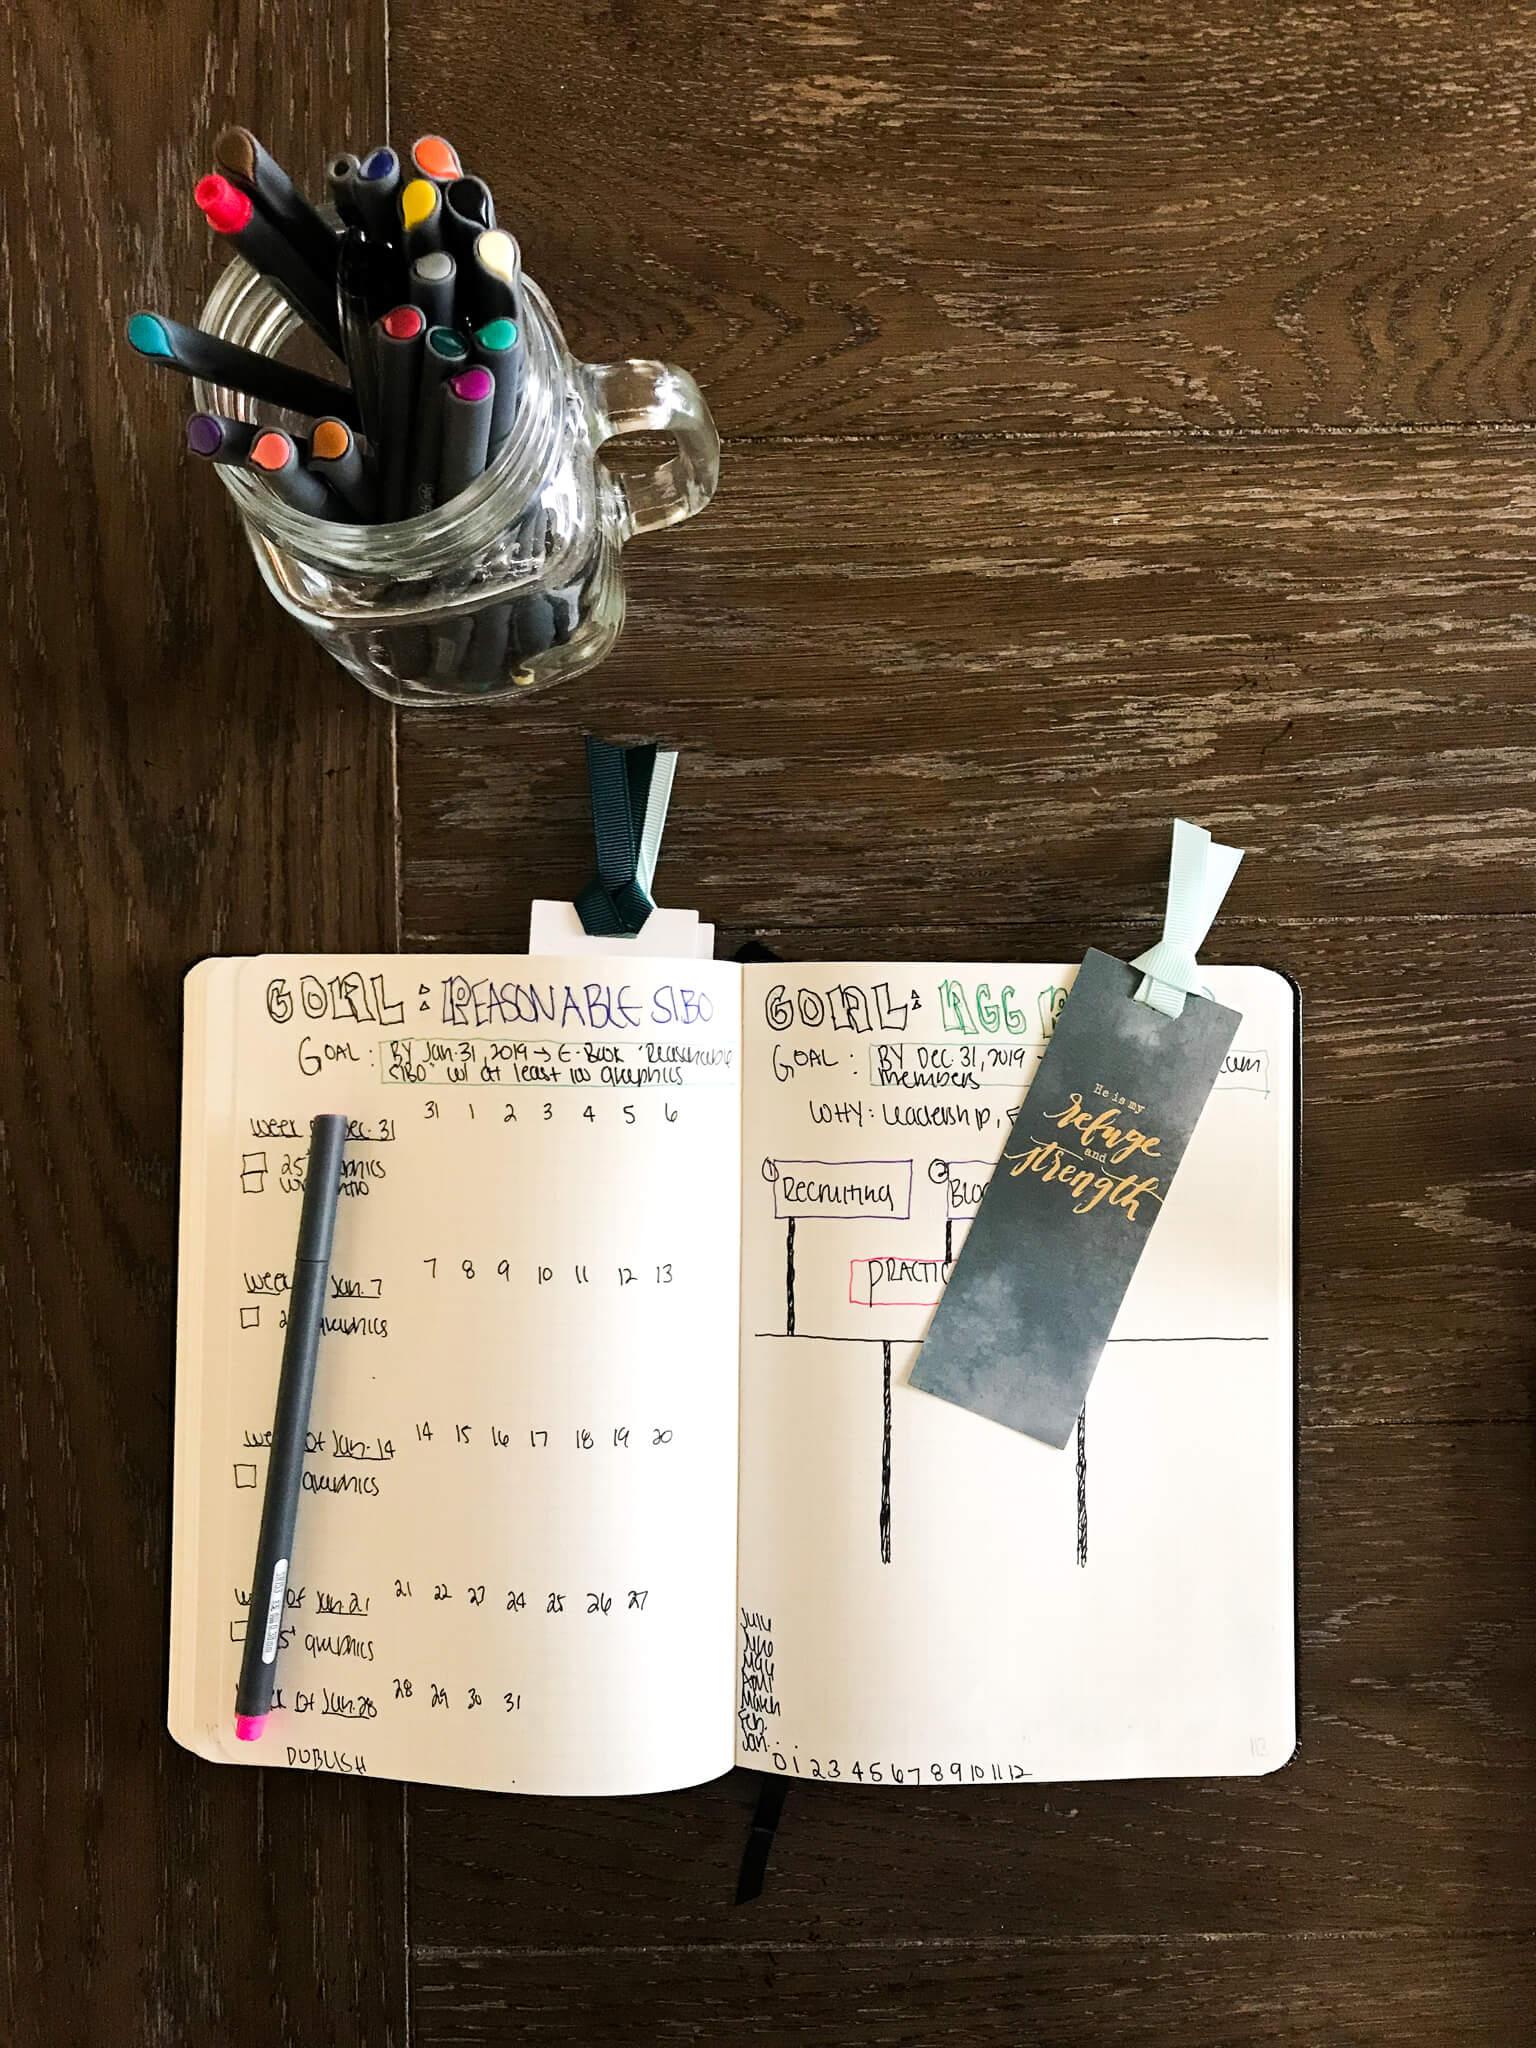 2019 Bullet Journal www.sarahkayhoffman.com #bulletjournal #bujo #healthyliving #mompreneur goal track setting